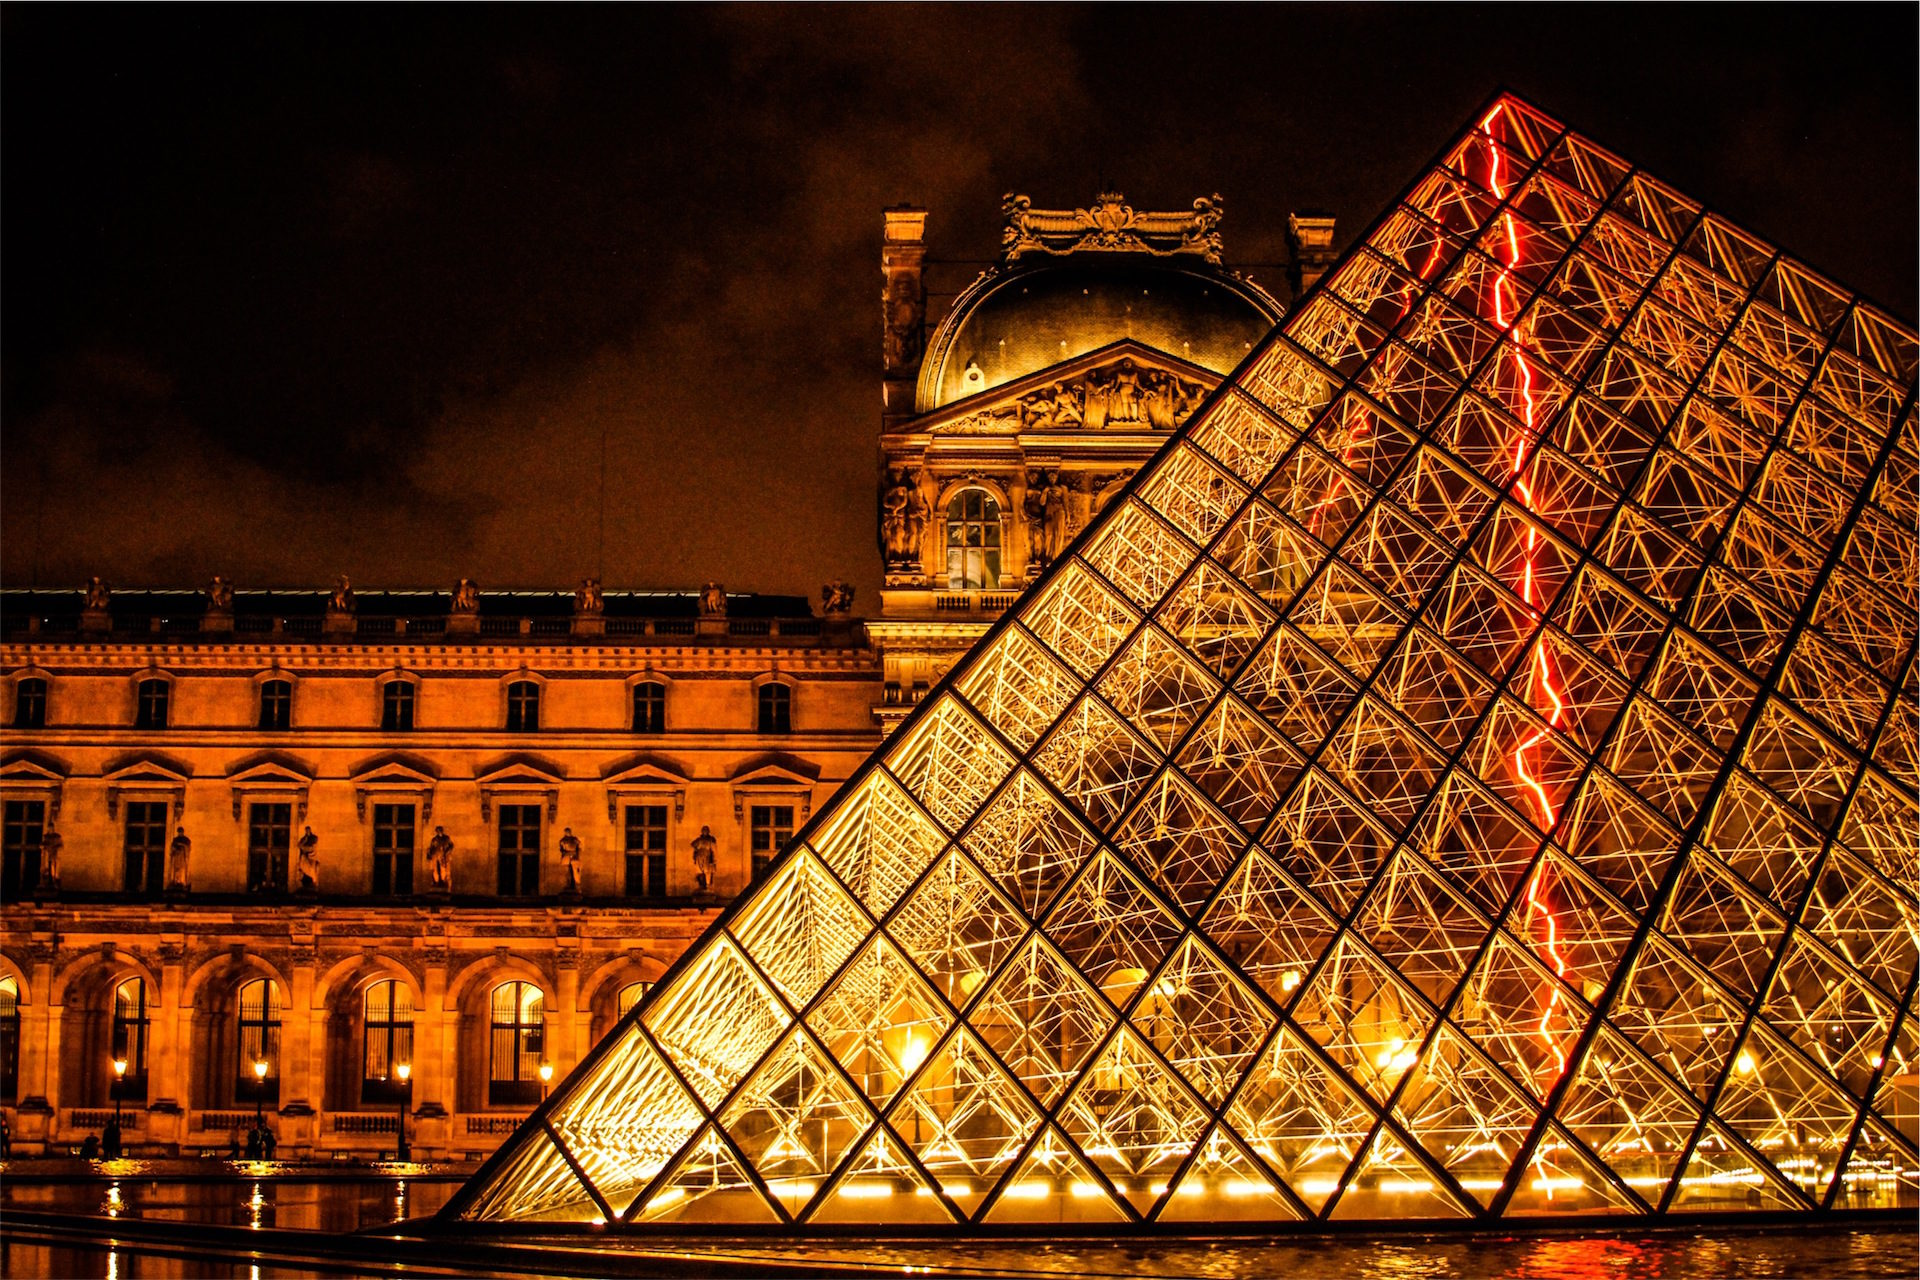 pirámide, लौवर, संग्रहालय, पेरिस, फ़्रांस - HD वॉलपेपर - प्रोफेसर-falken.com